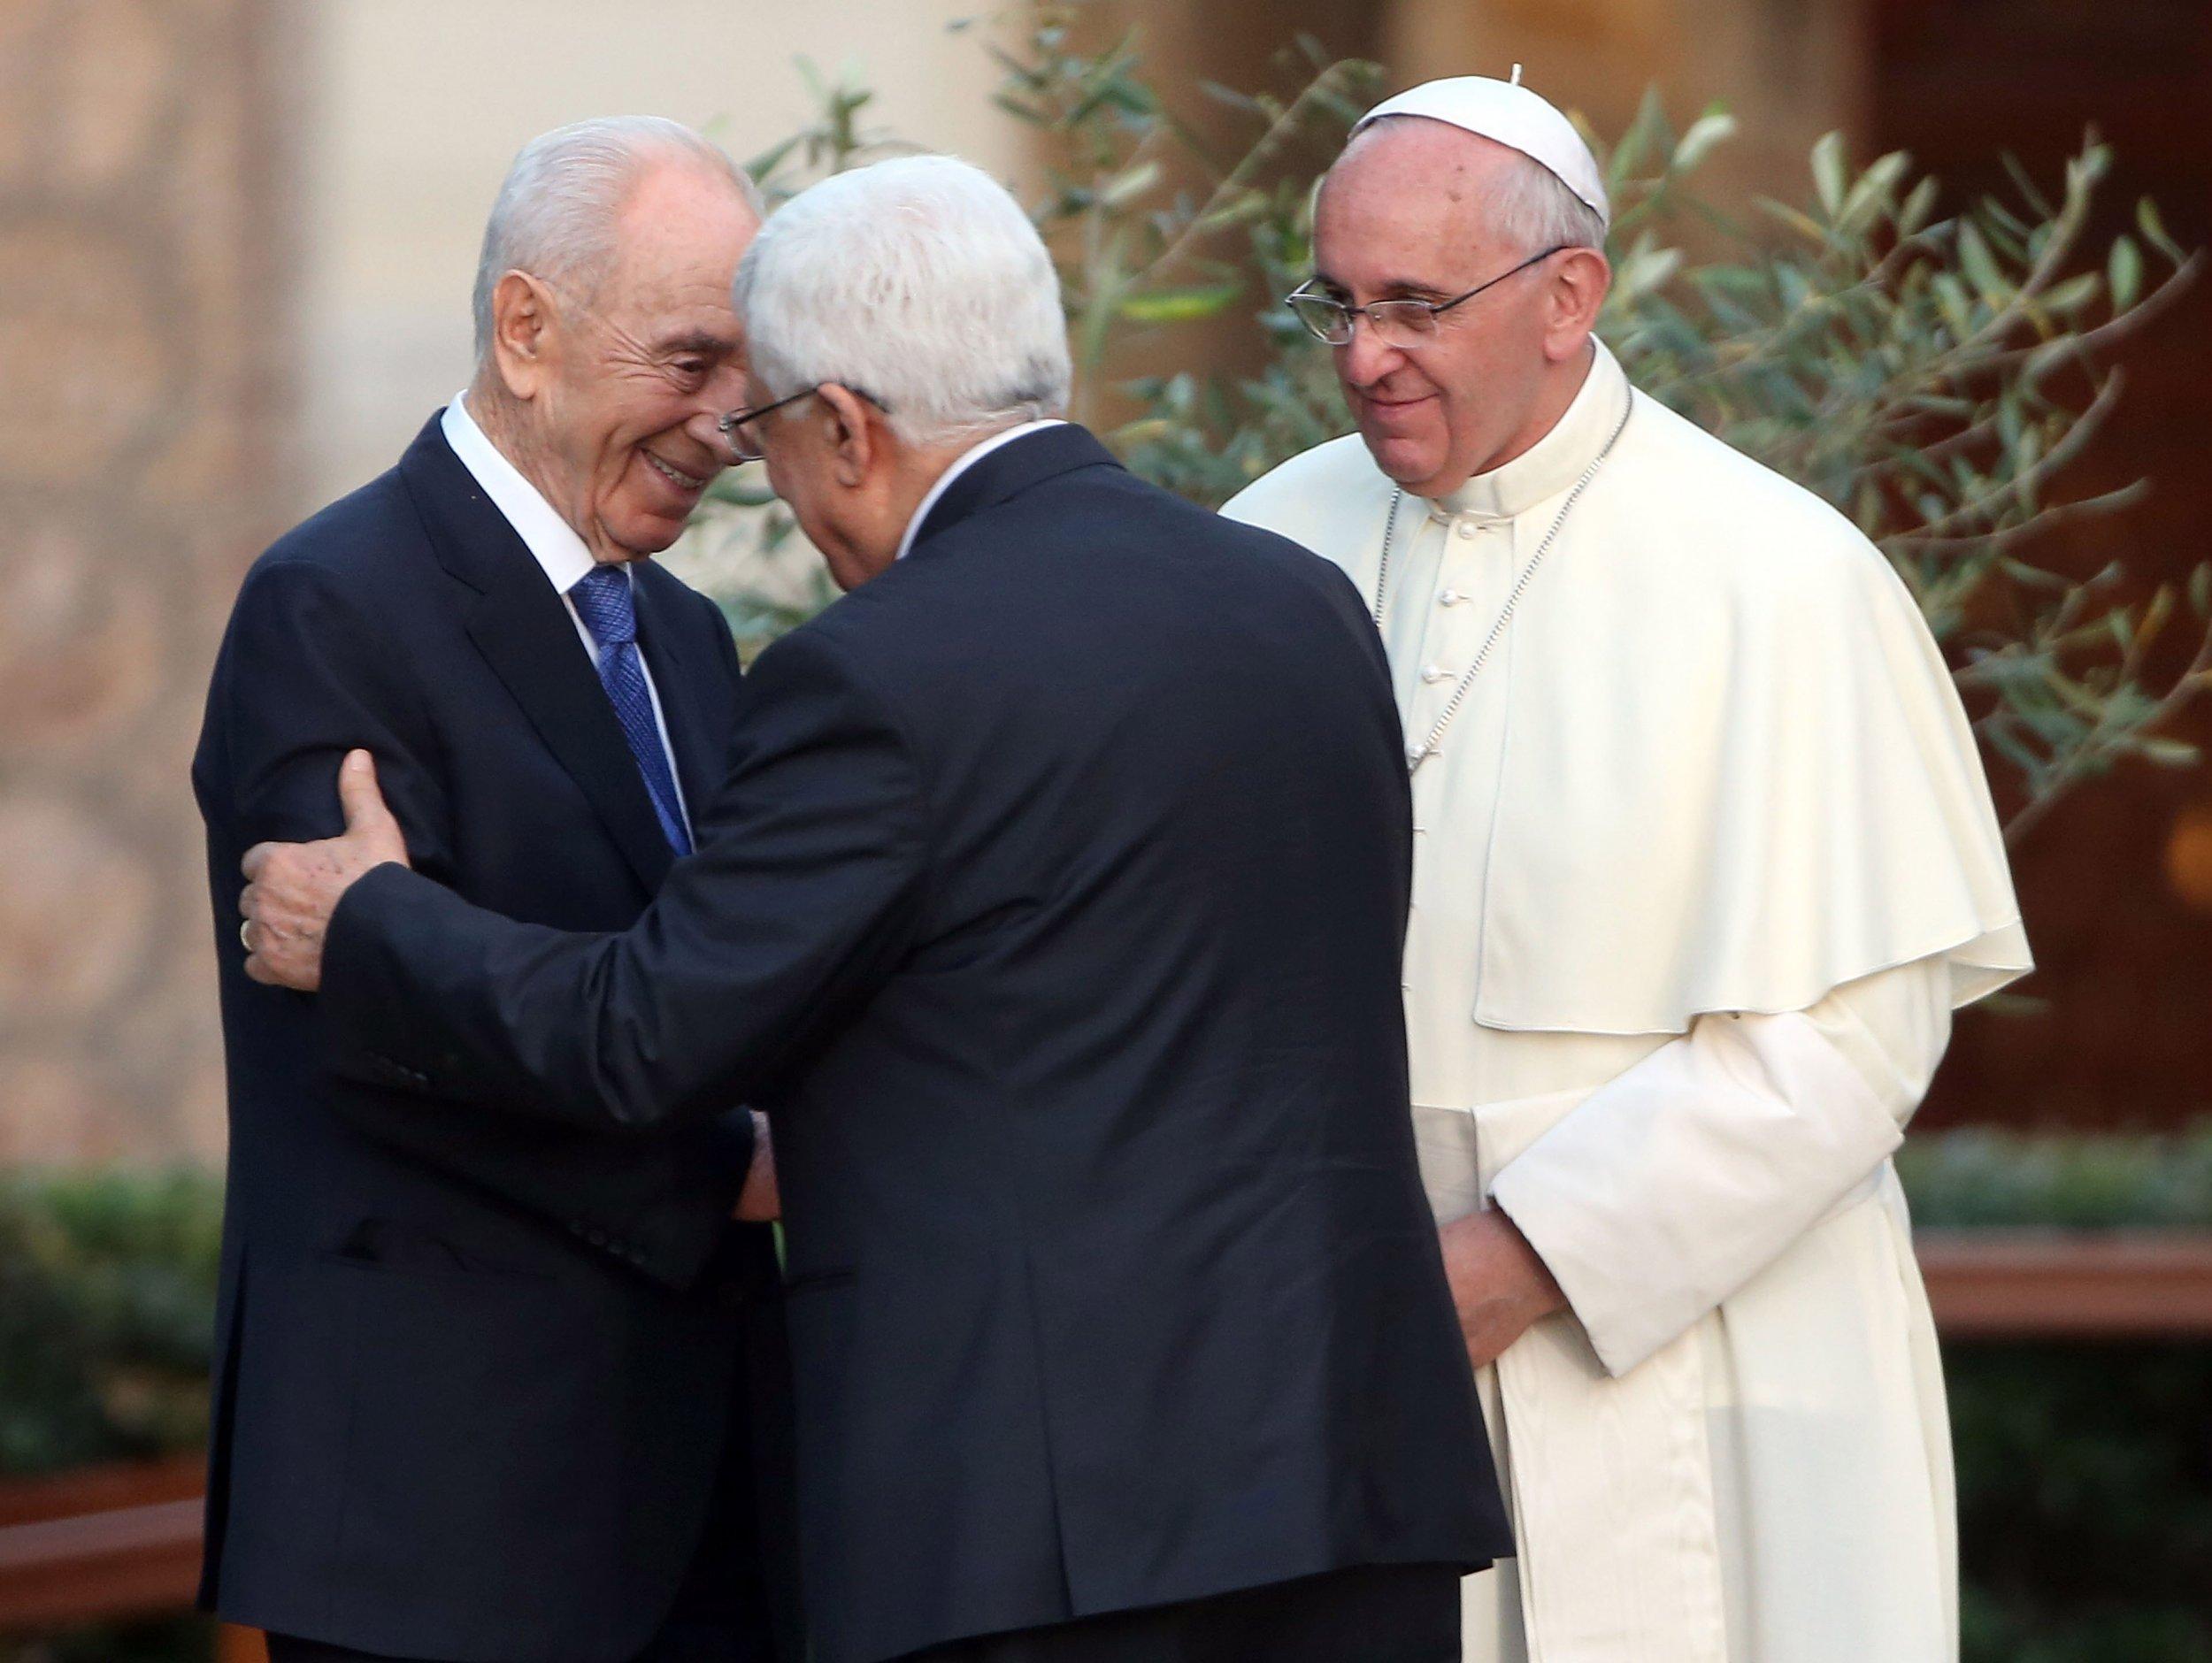 Palestinian President Mahmoud Abbas and Shimon Peres